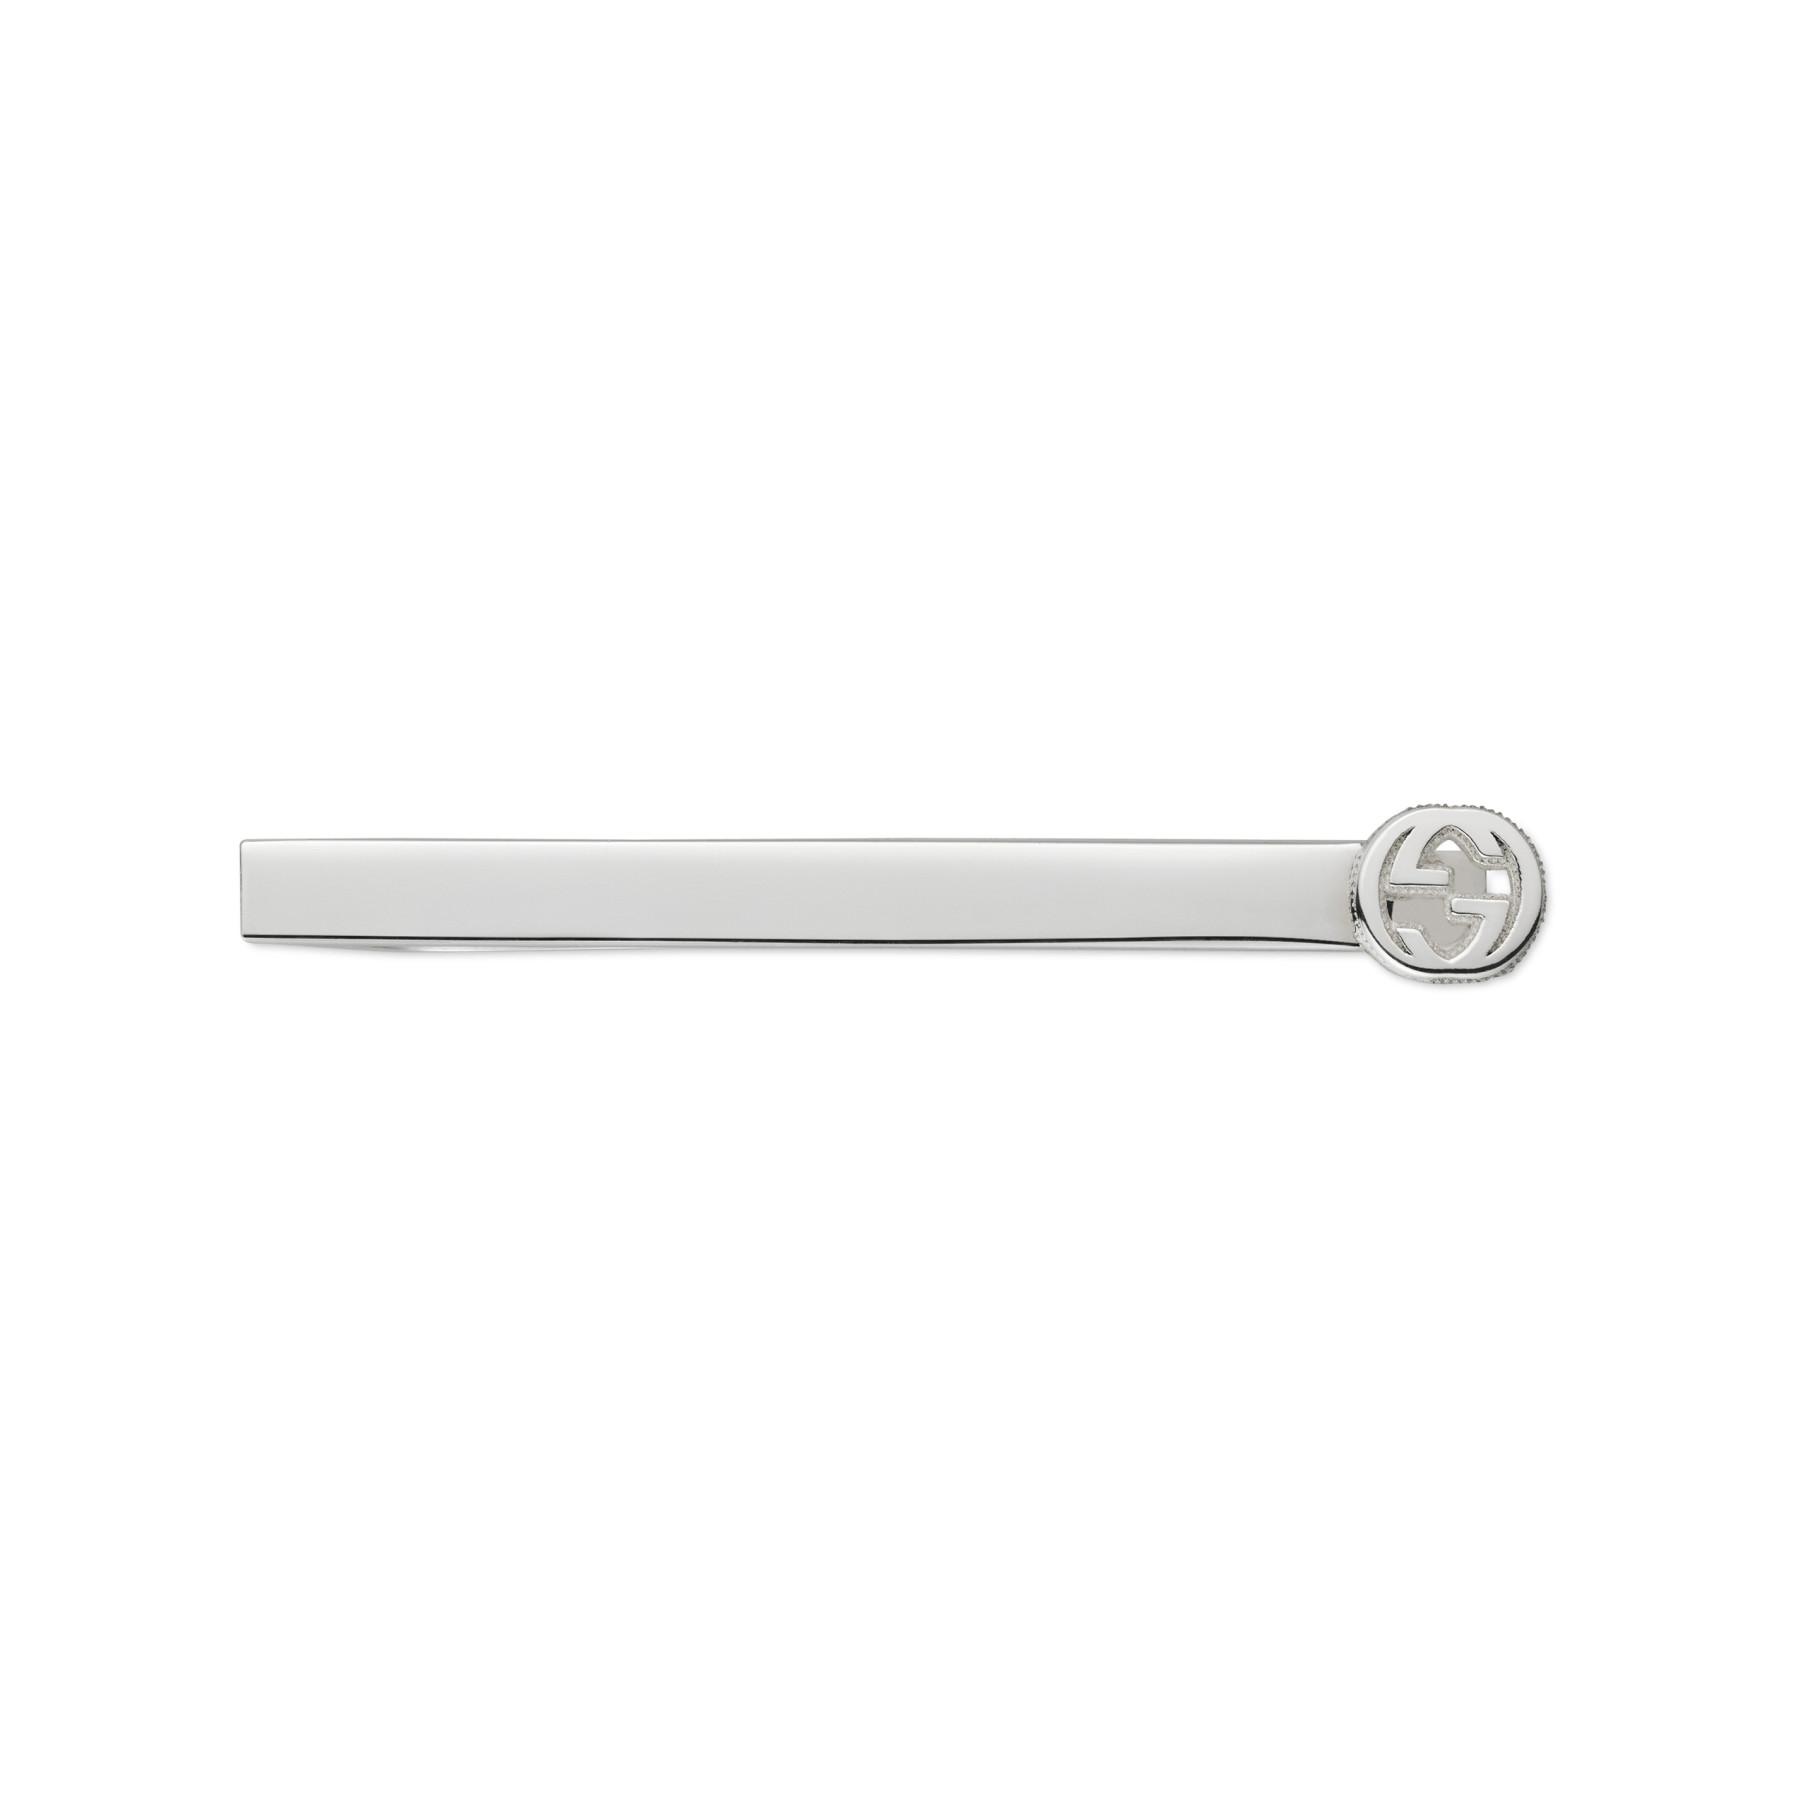 Gucci Silver Interlocking G Tie Bar